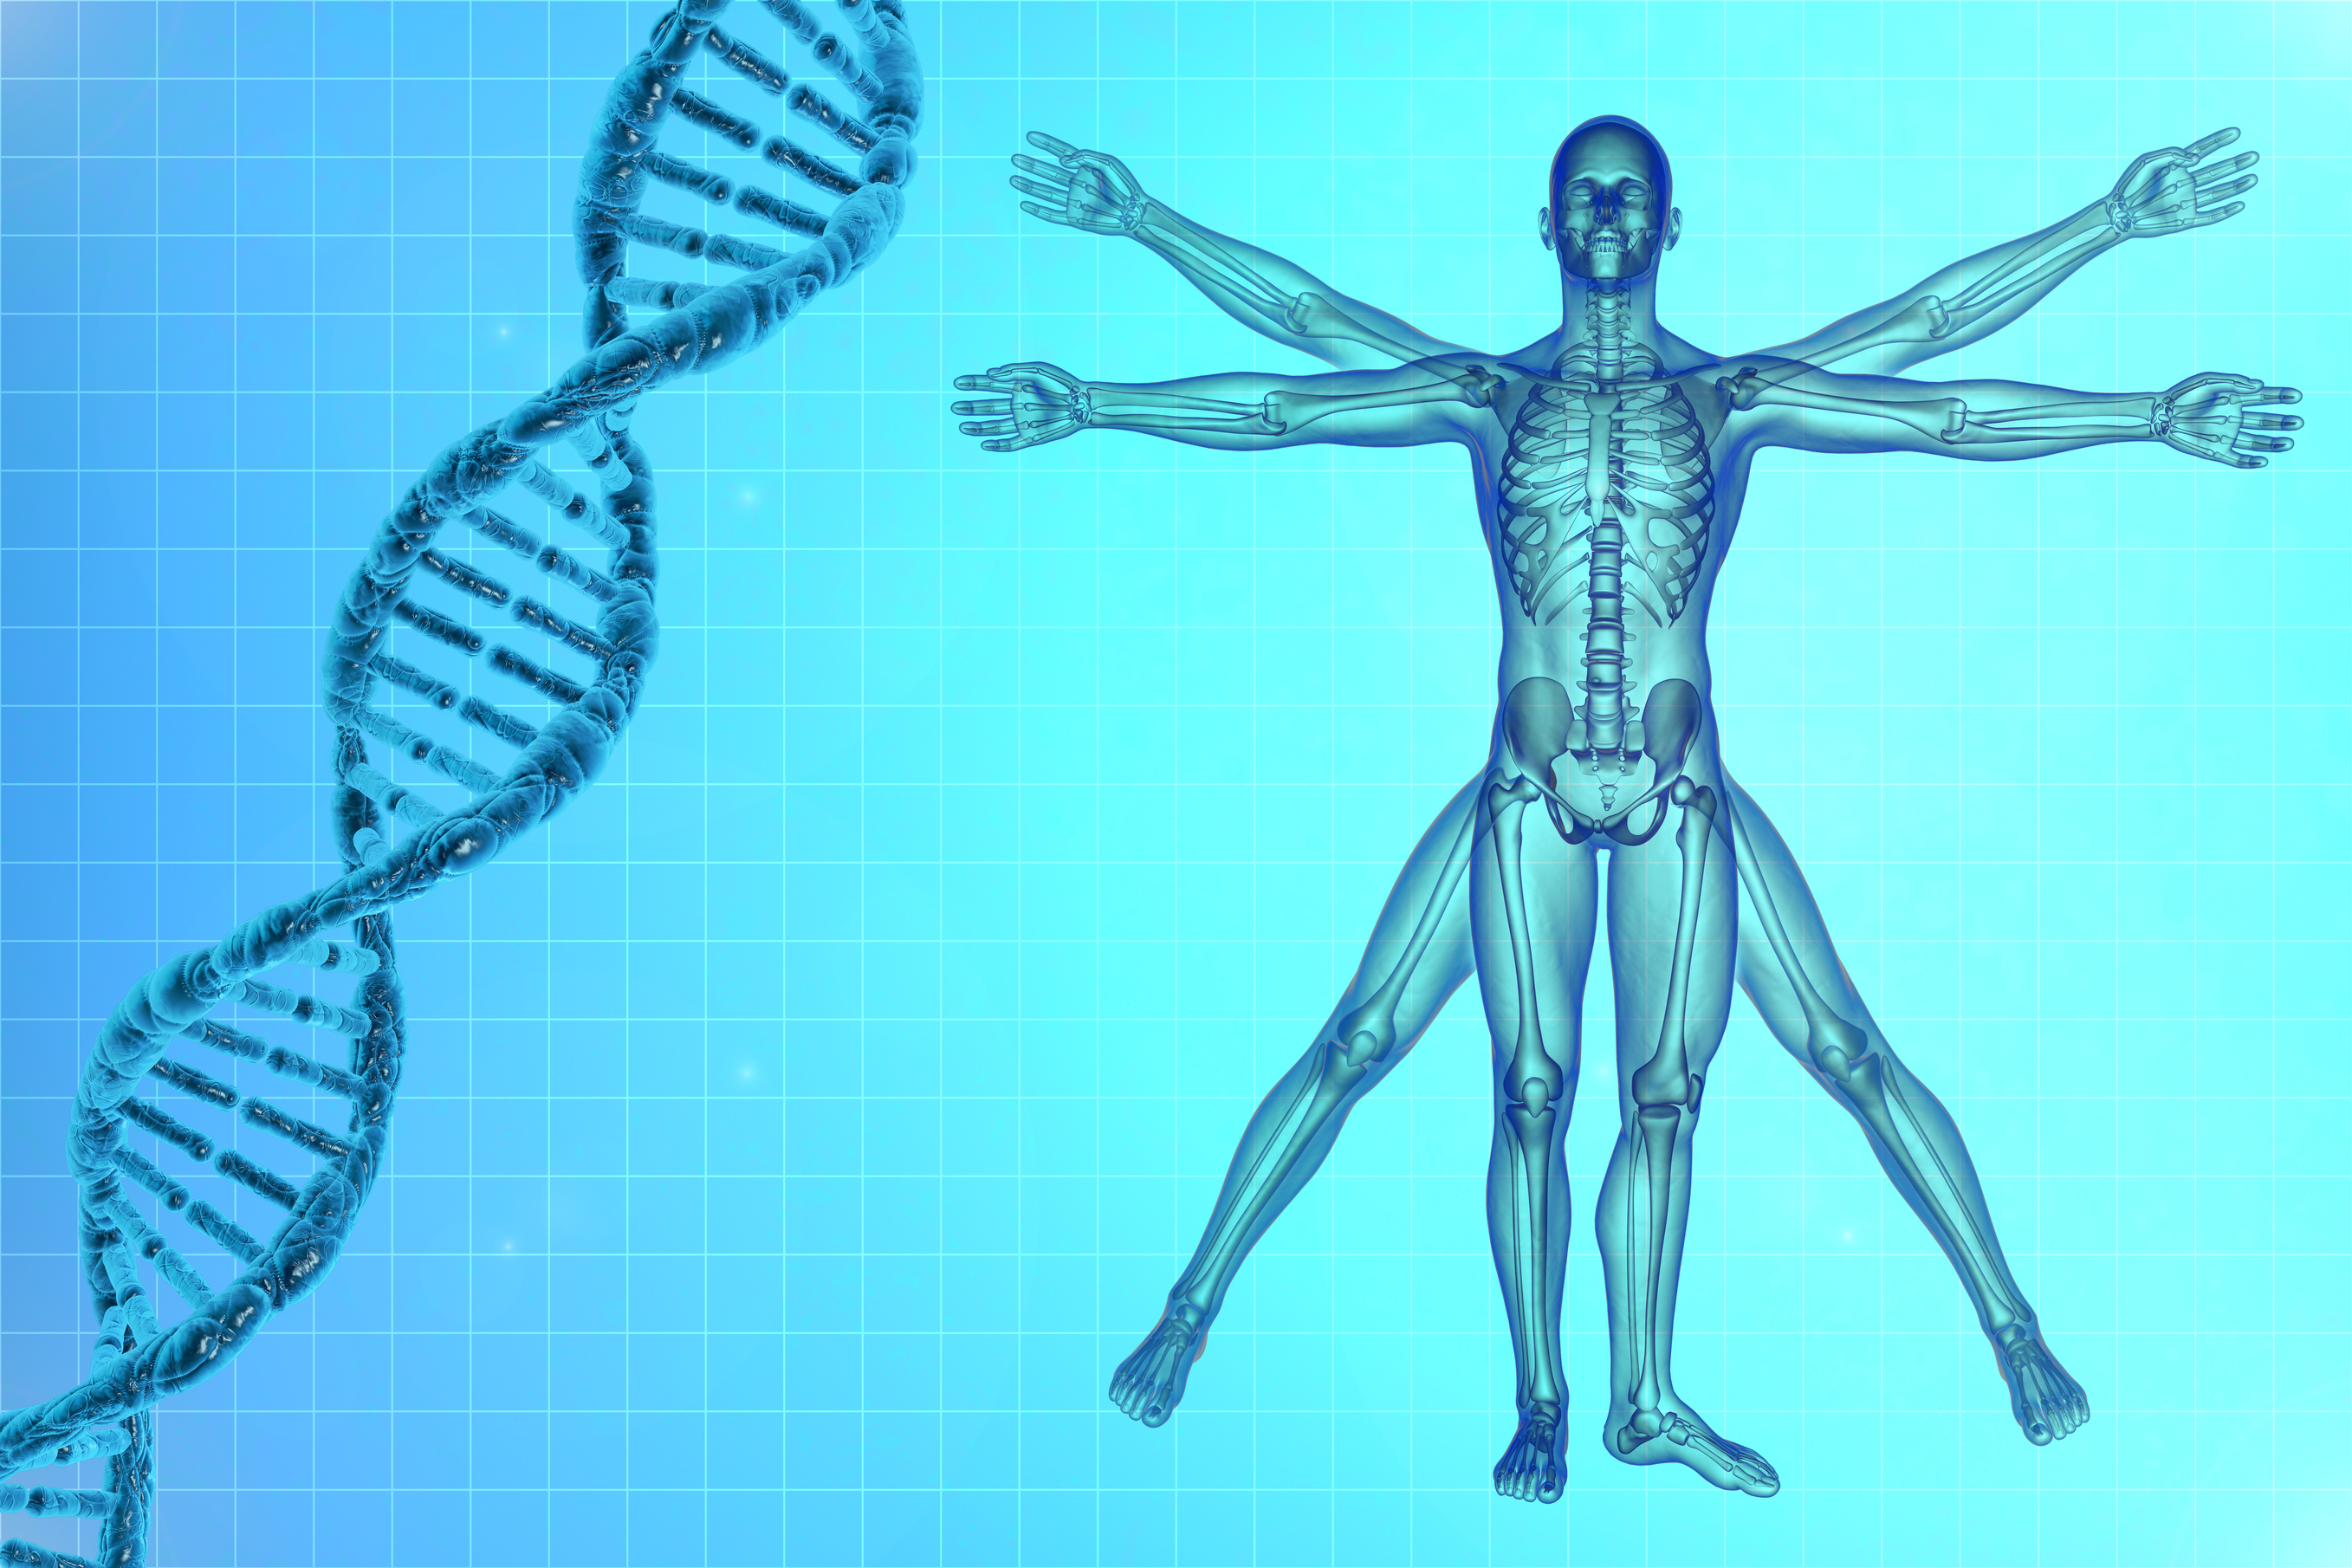 DNA, life sciences, medicine, de vinci